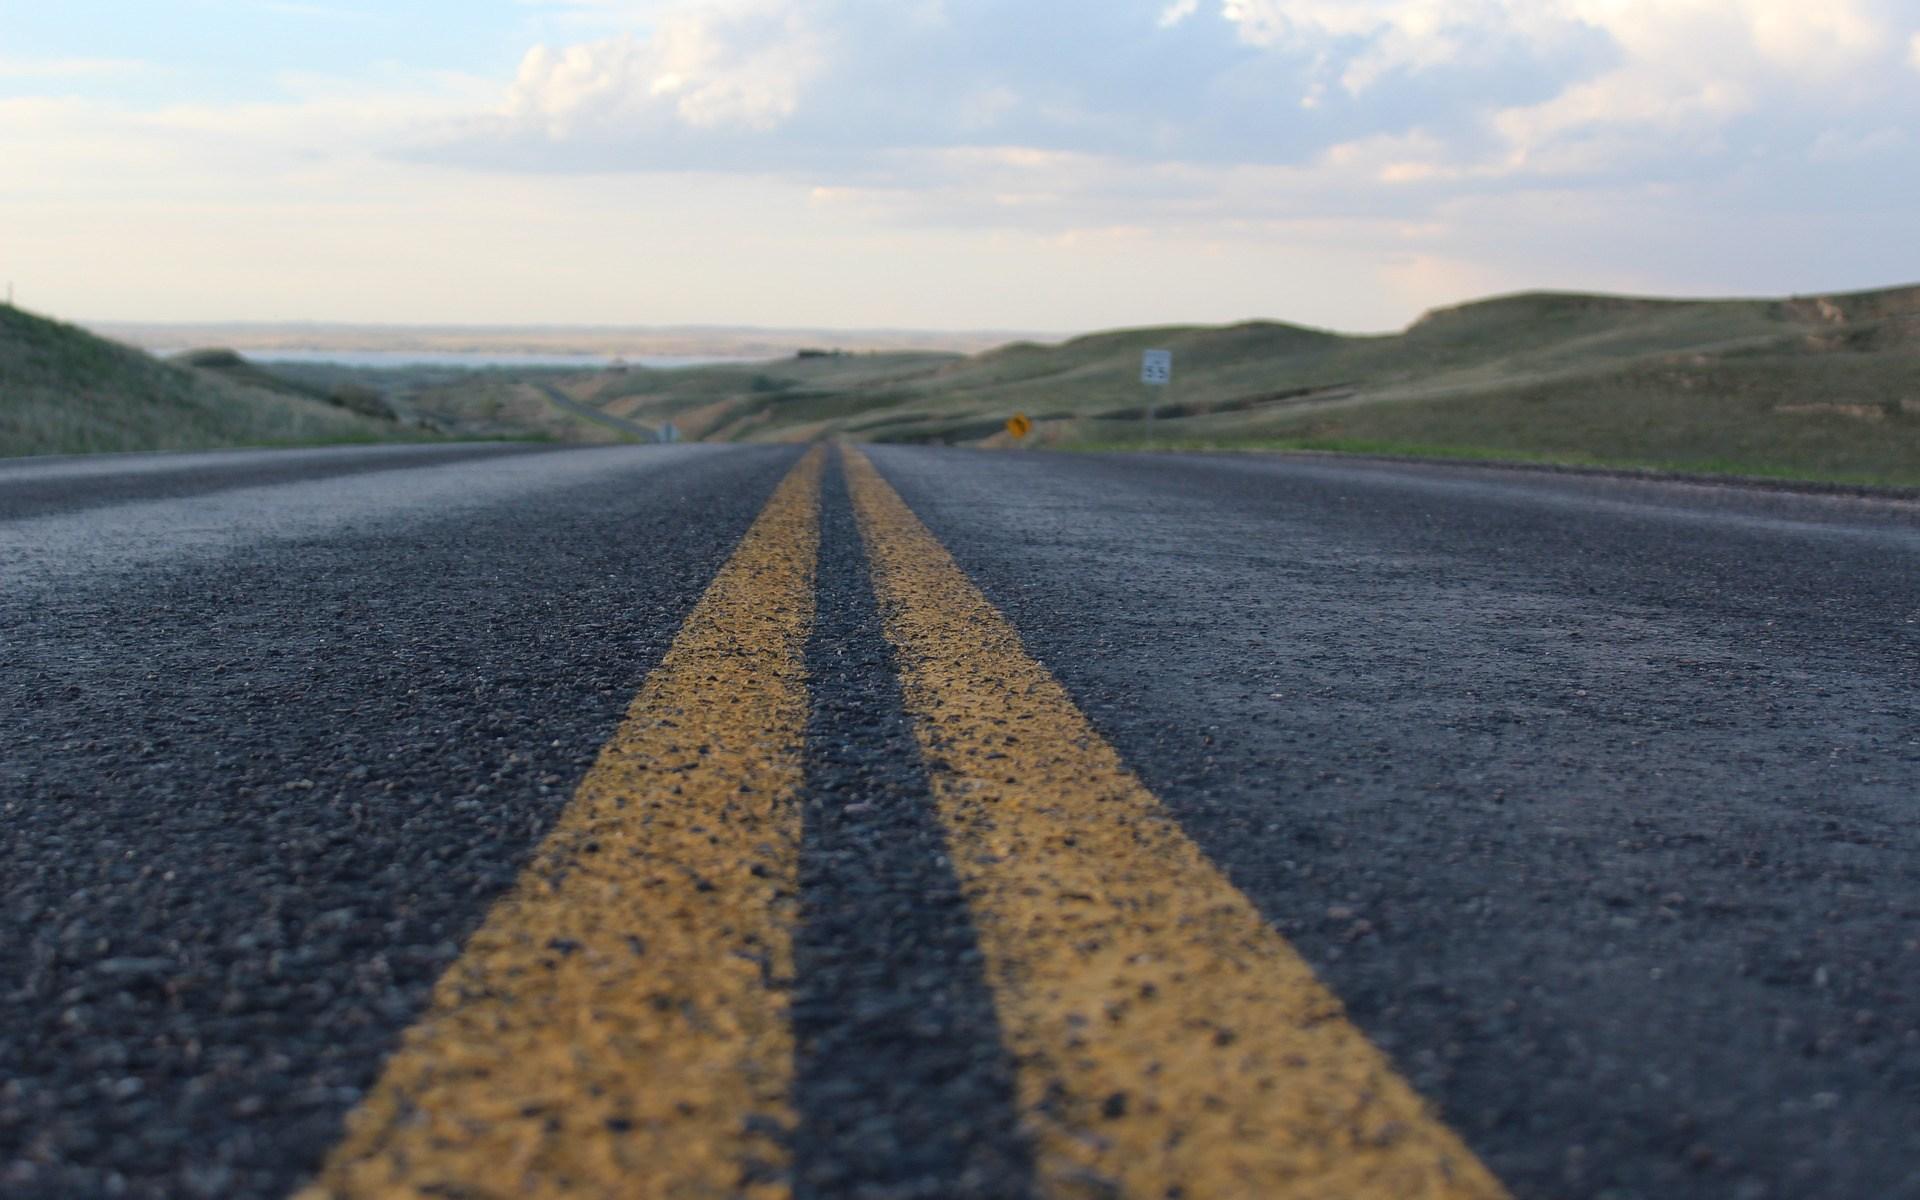 cierre de autopista